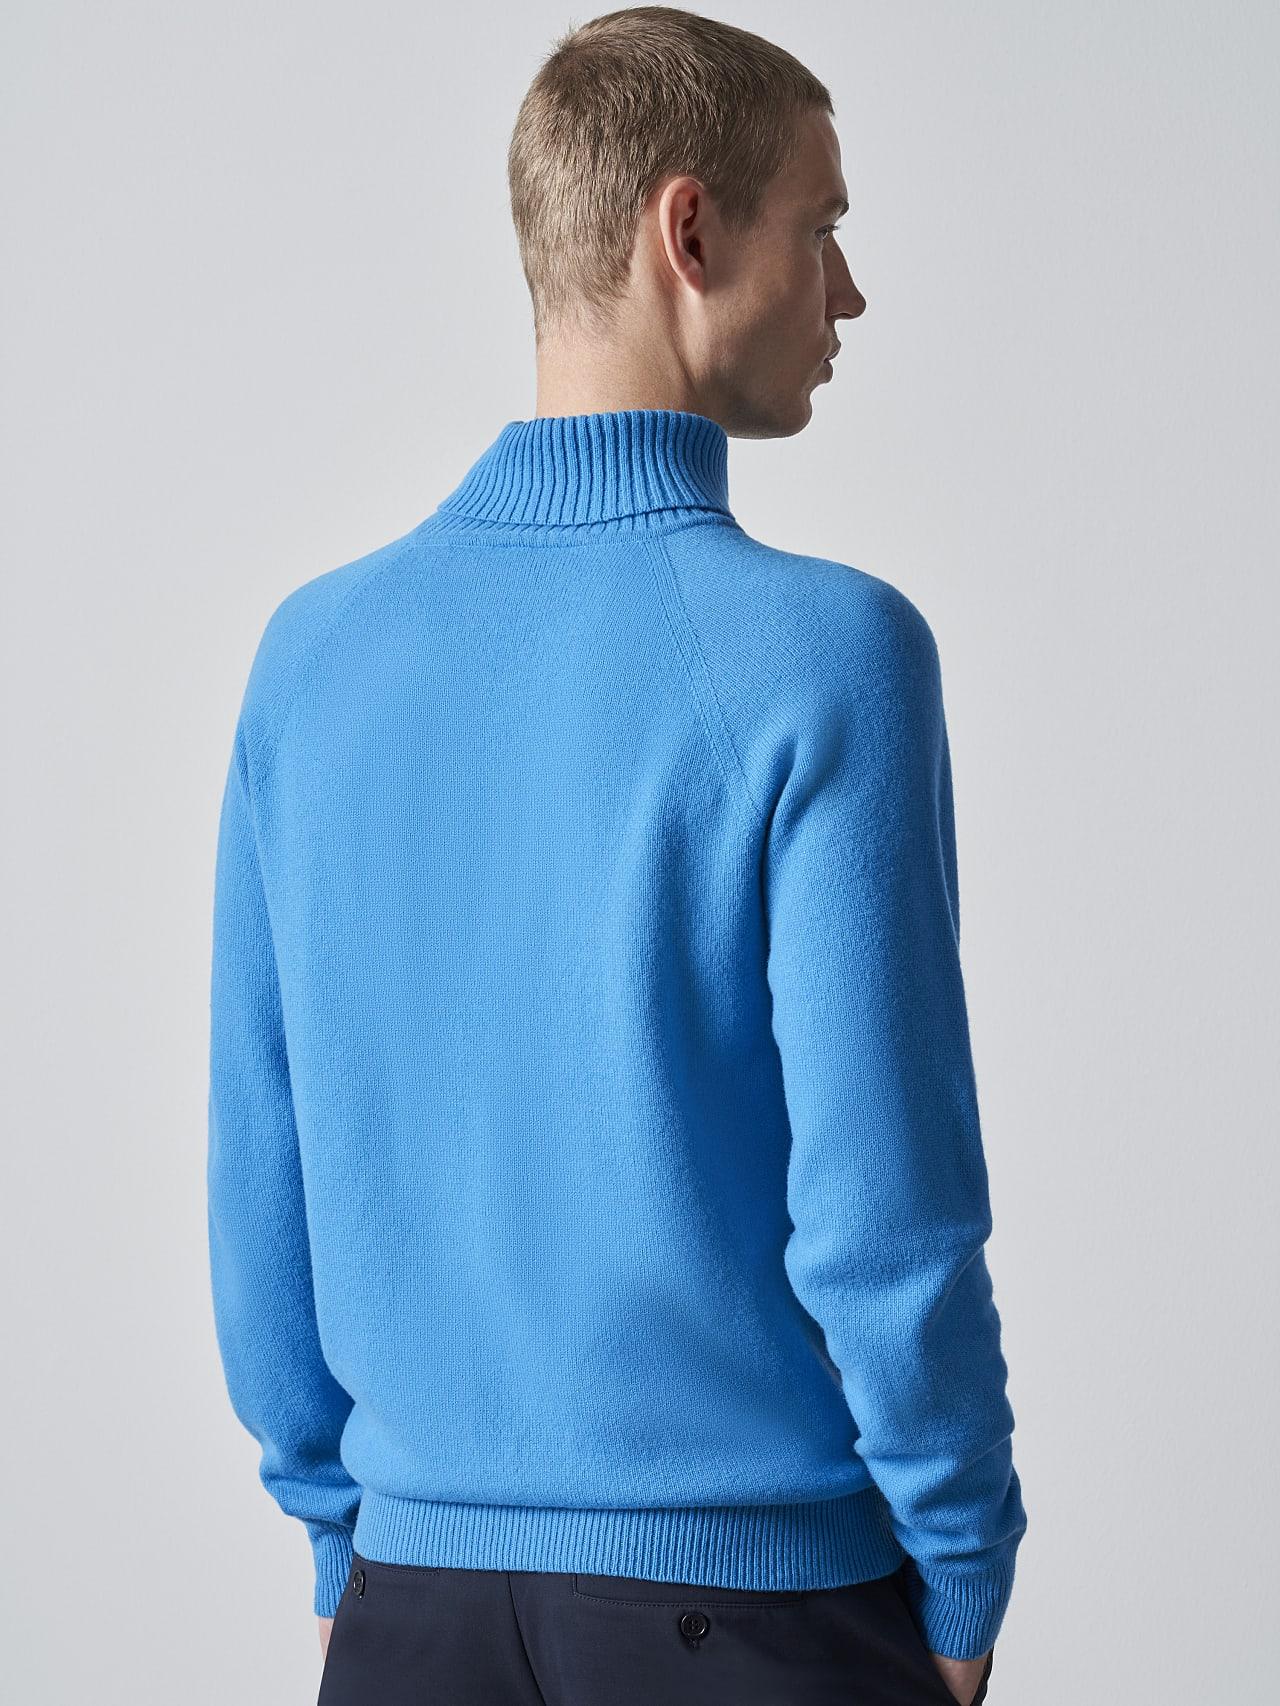 FLUCK V2.Y5.02 Seamless 3D Knit Cashmere-Blend Turtle Neck blue Front Main Alpha Tauri